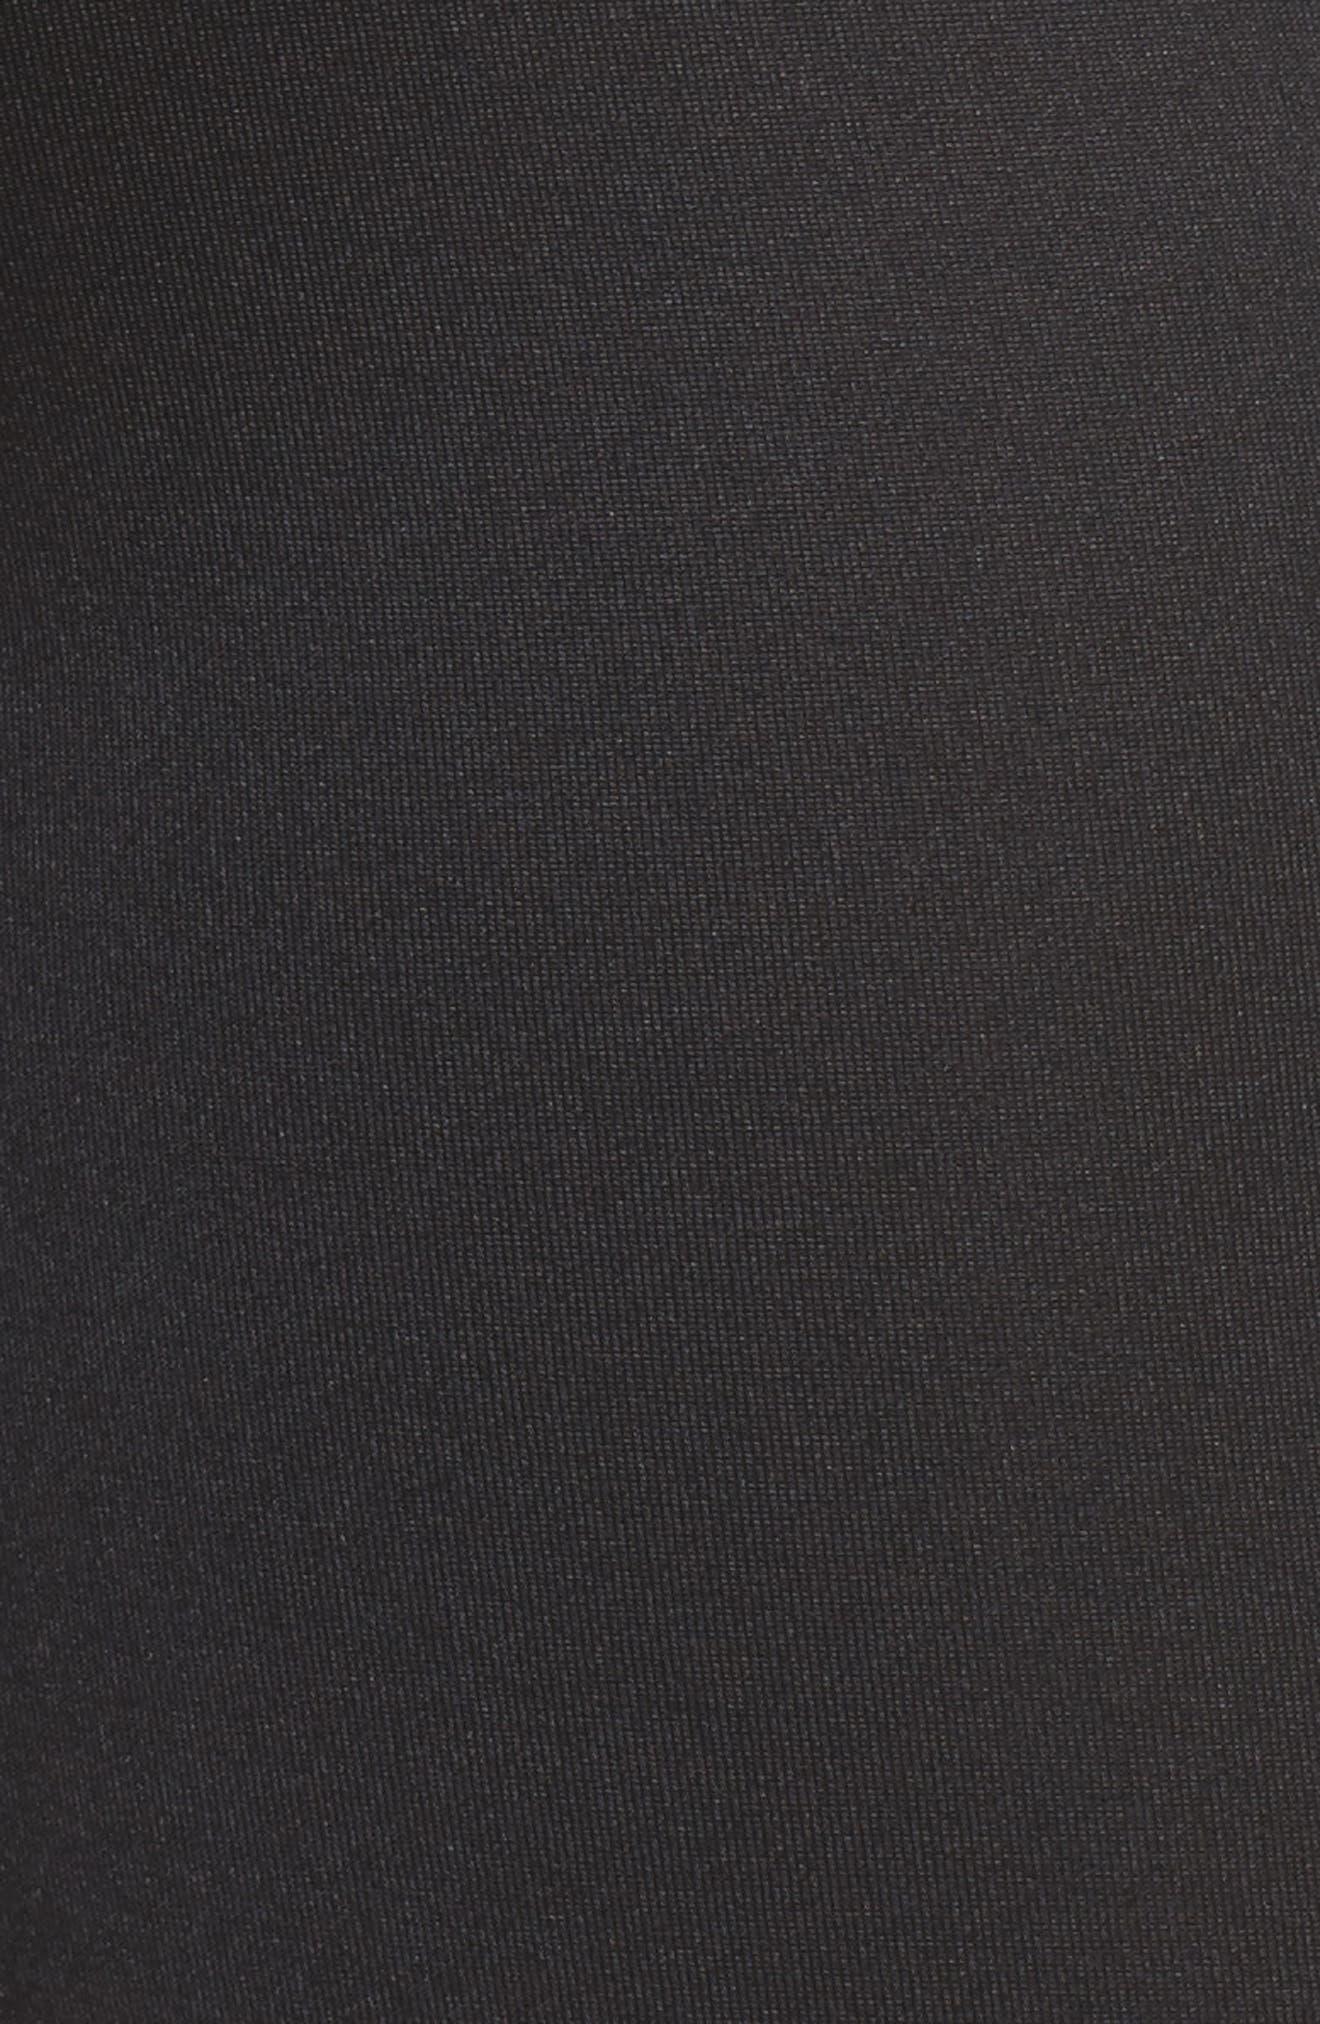 Essential Shorts,                             Alternate thumbnail 3, color,                             Black